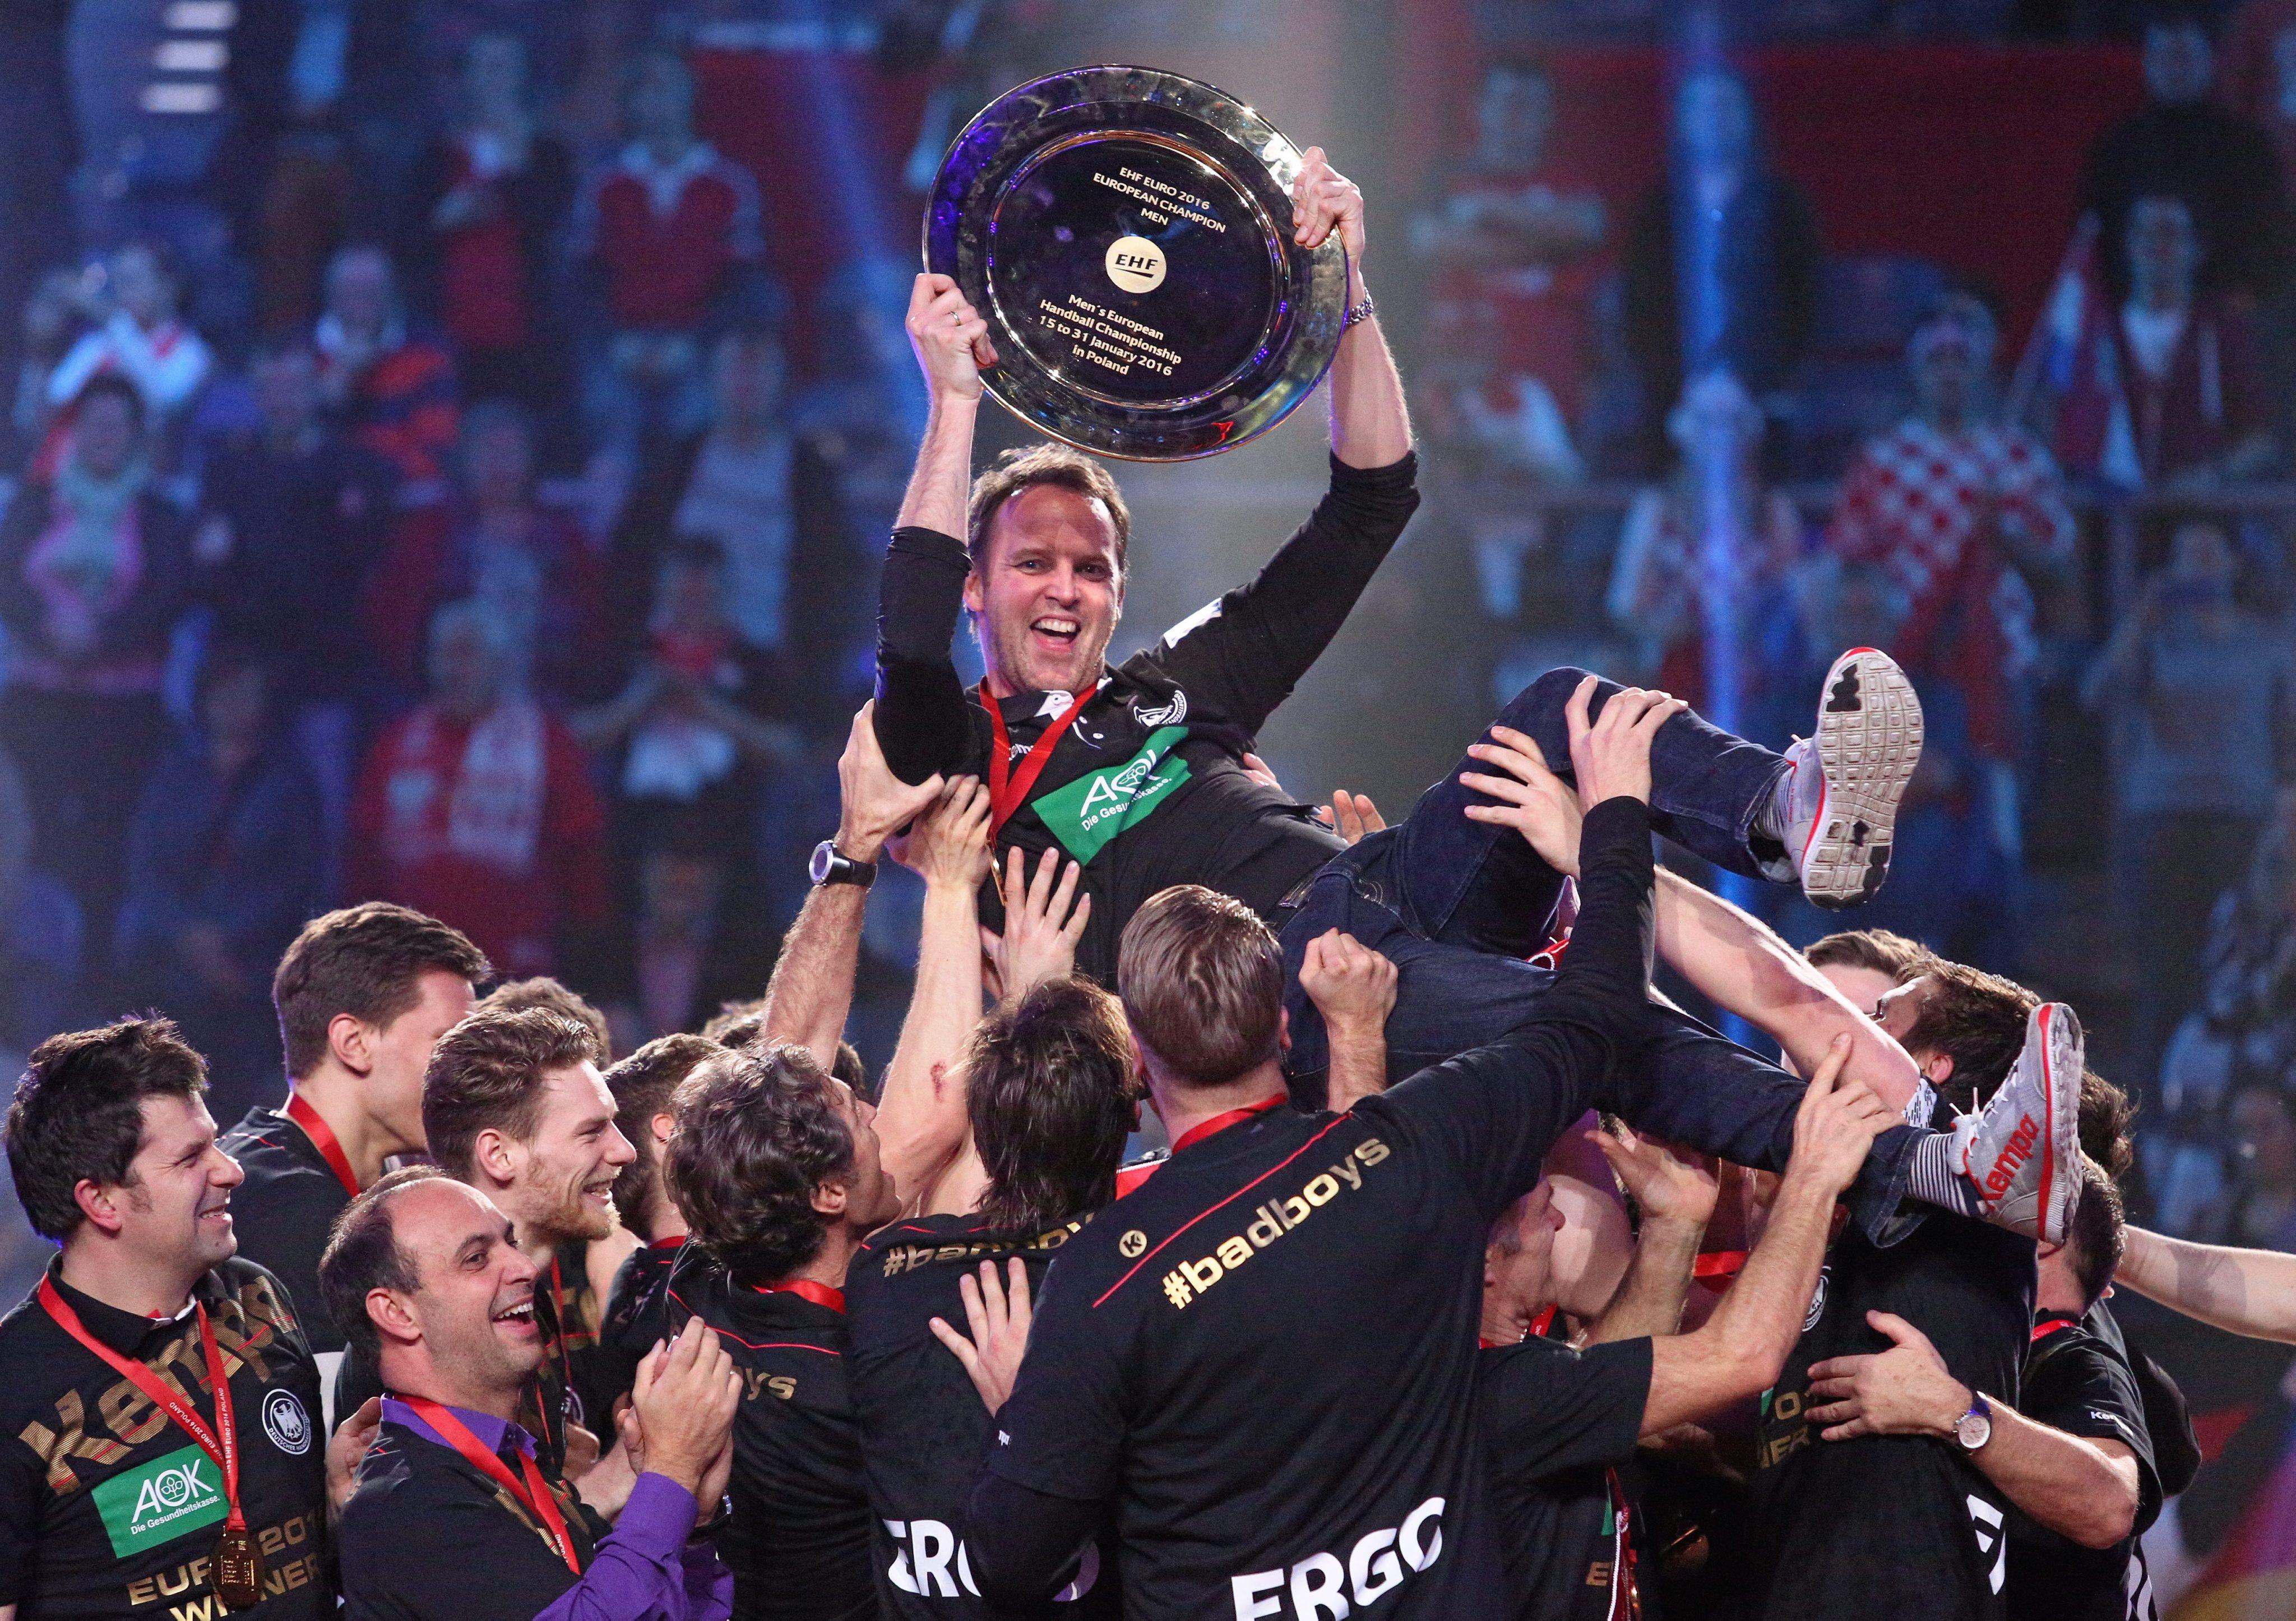 Handball EM 2016 - Finale: Dagur Sigurdsson mit dem Pokal.